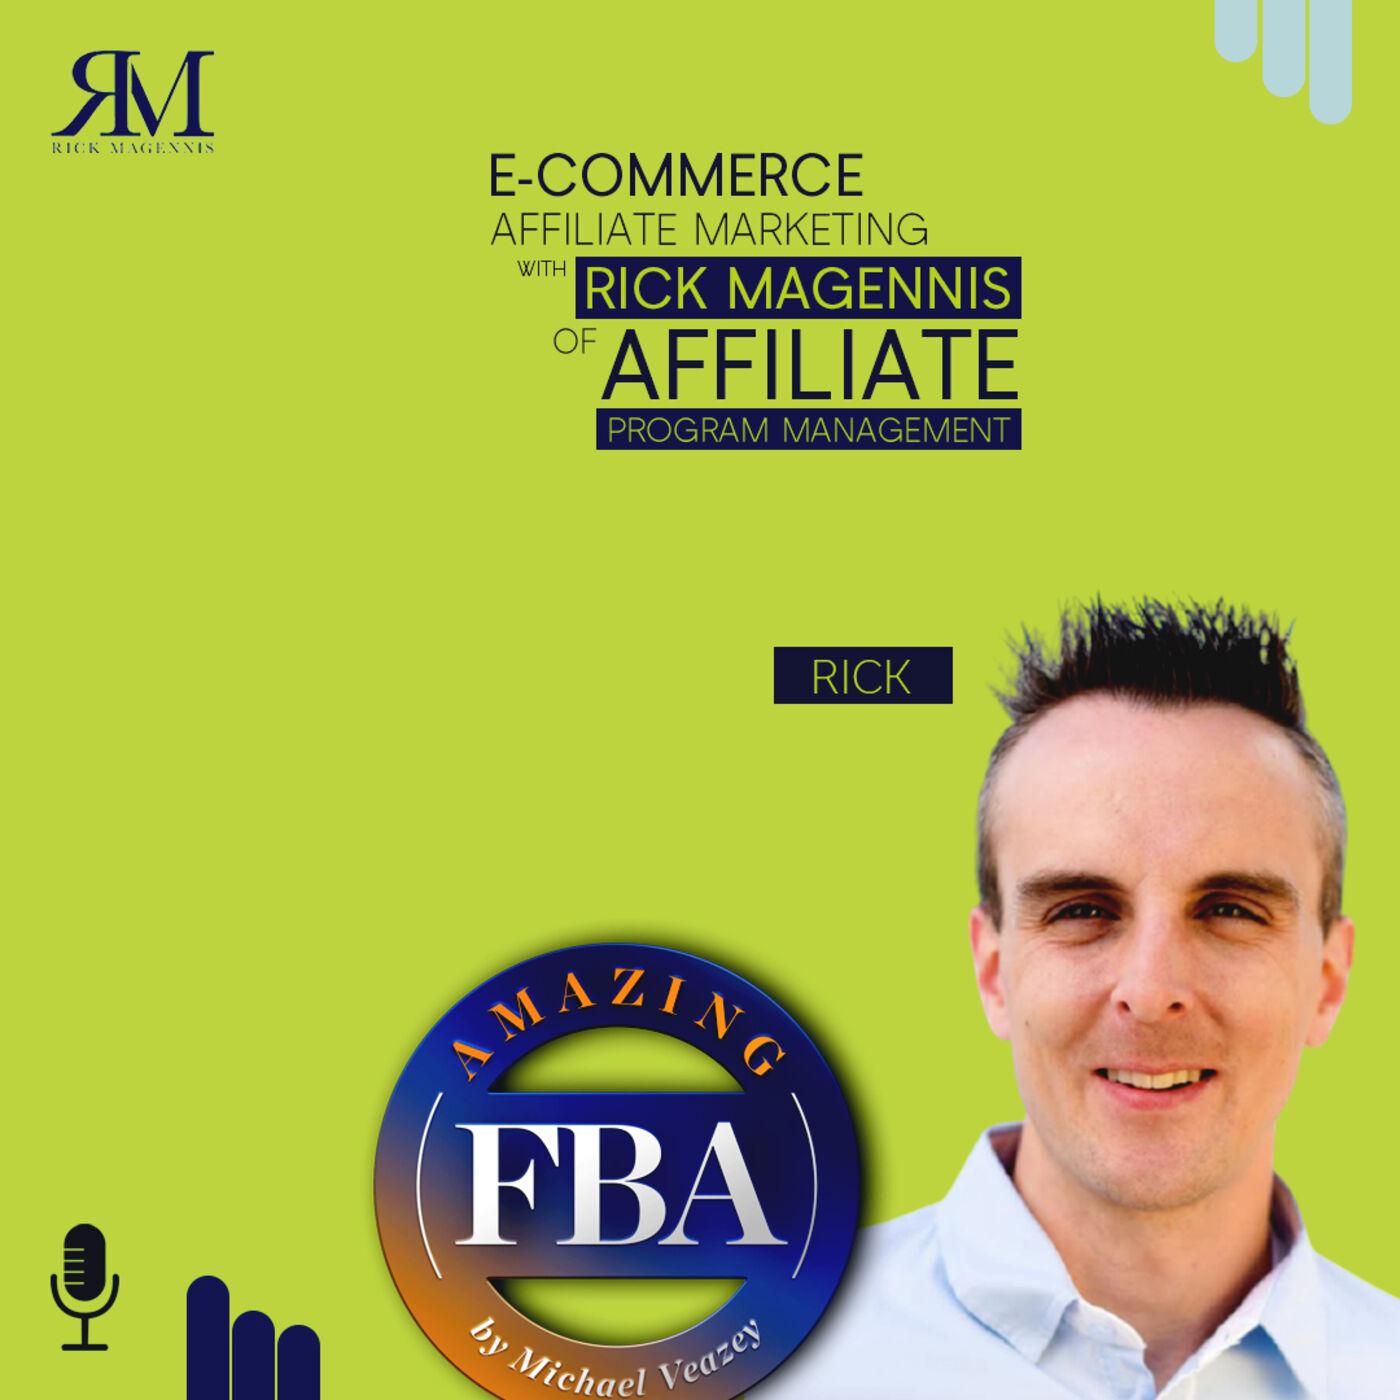 E-commerce Affiliate Marketing with Rick Magennis of Affiliate Program Management